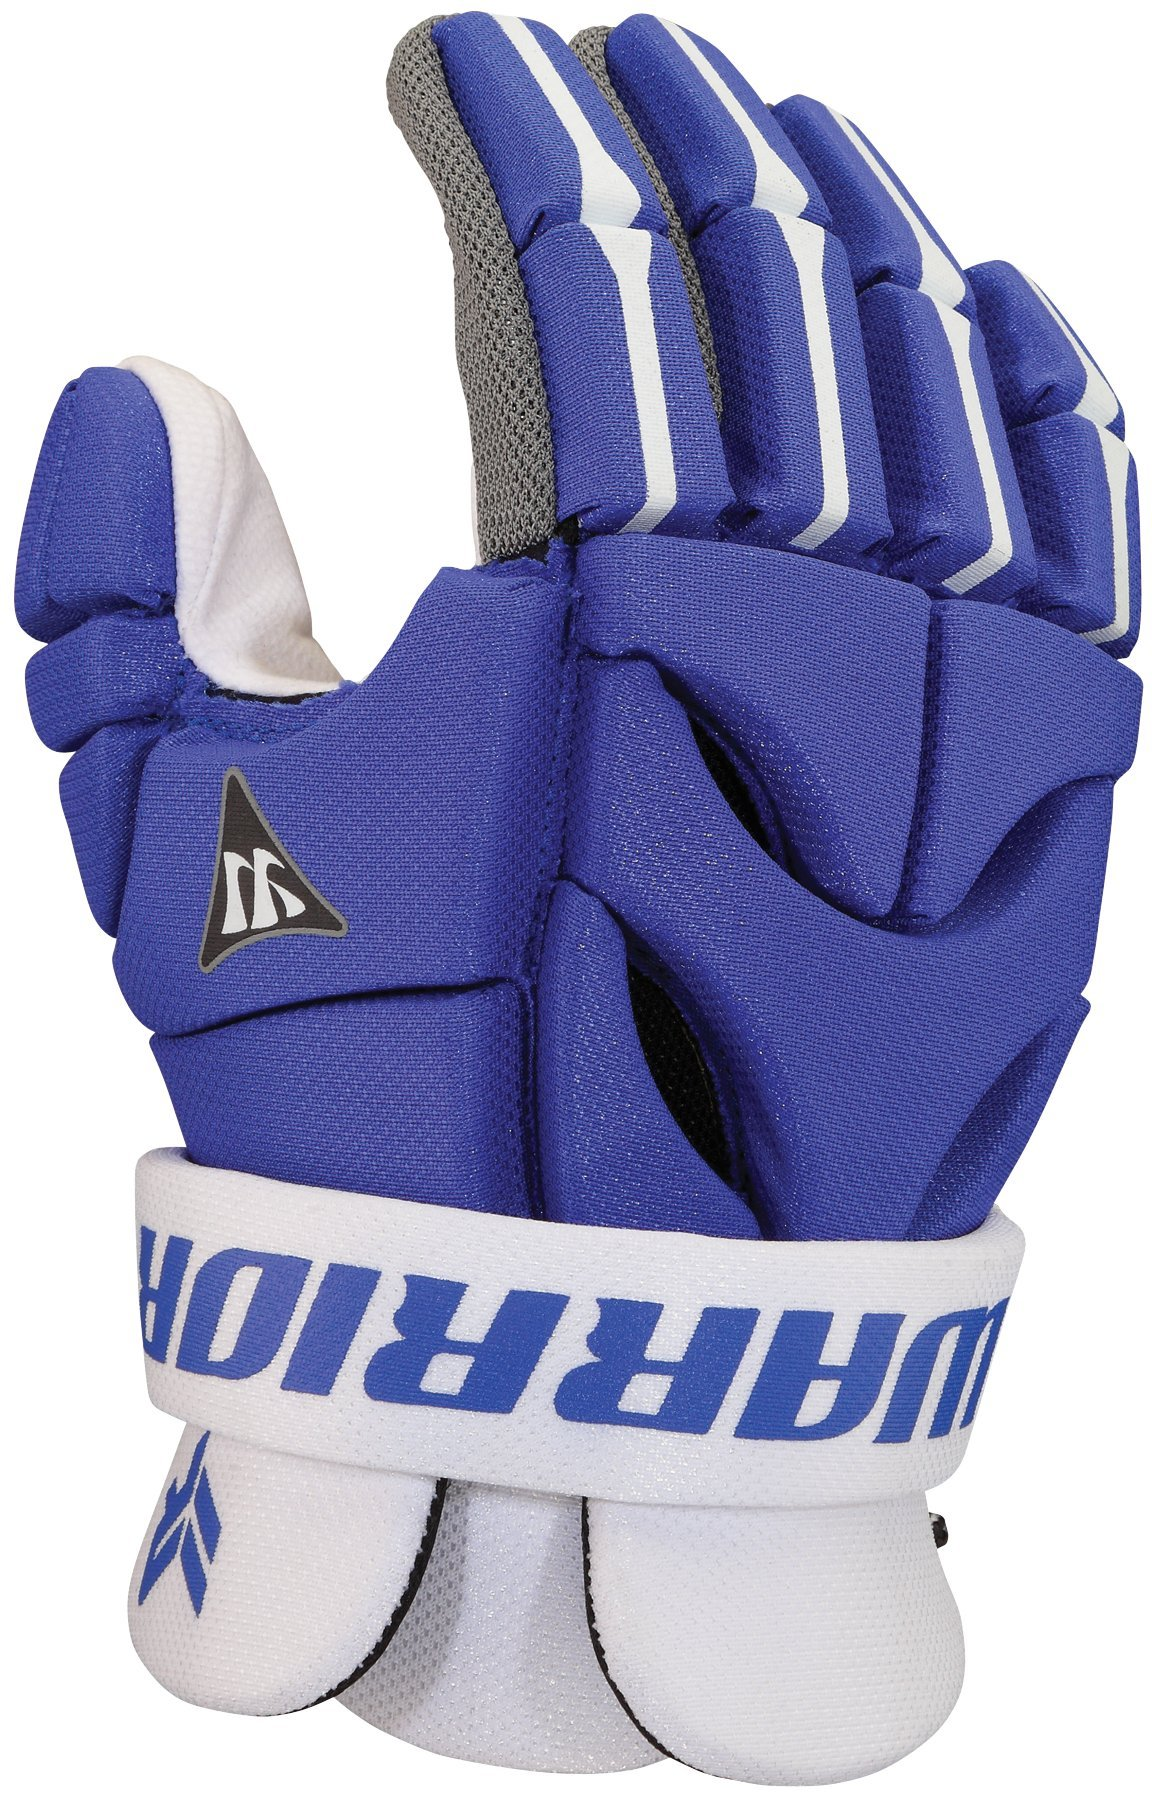 Warrior Rabil Next Gloves, Royal Blue, 12''